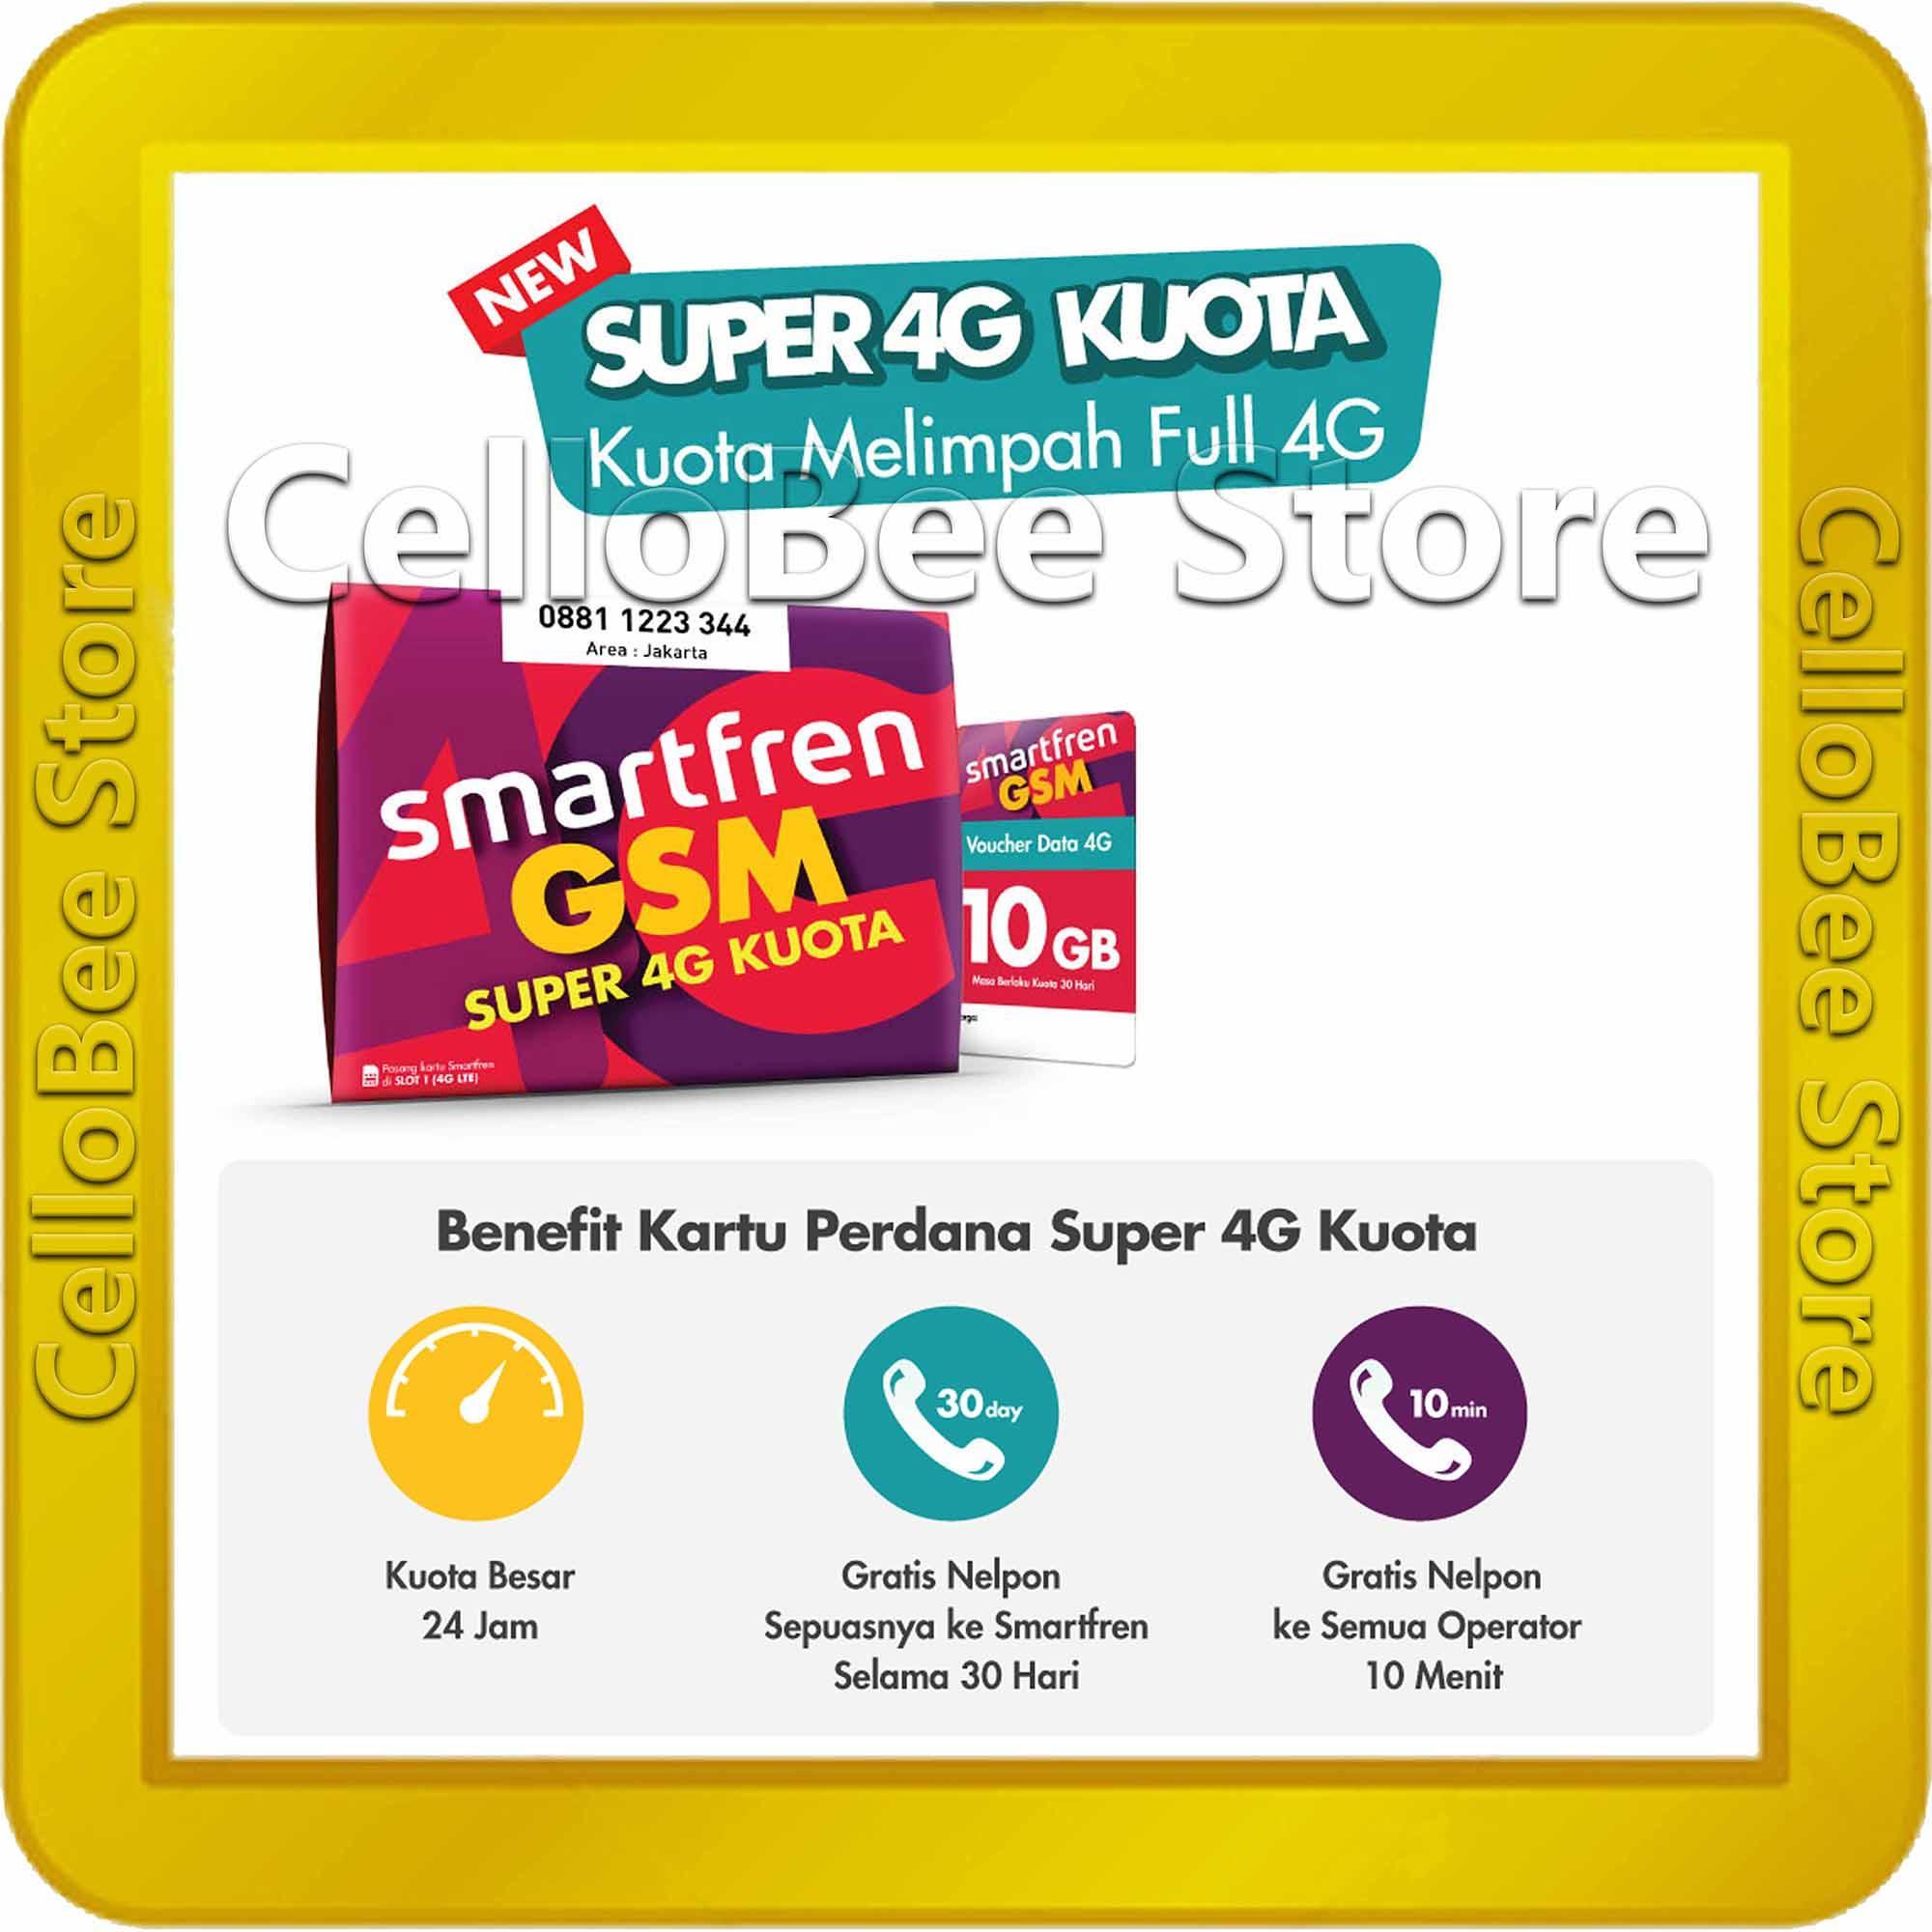 Kartu Sim Perdana Selular Indosat Kuota 35gb 15 20 Gb 4g 24 Jam Smartfren Sp Gsm New Super 10gb